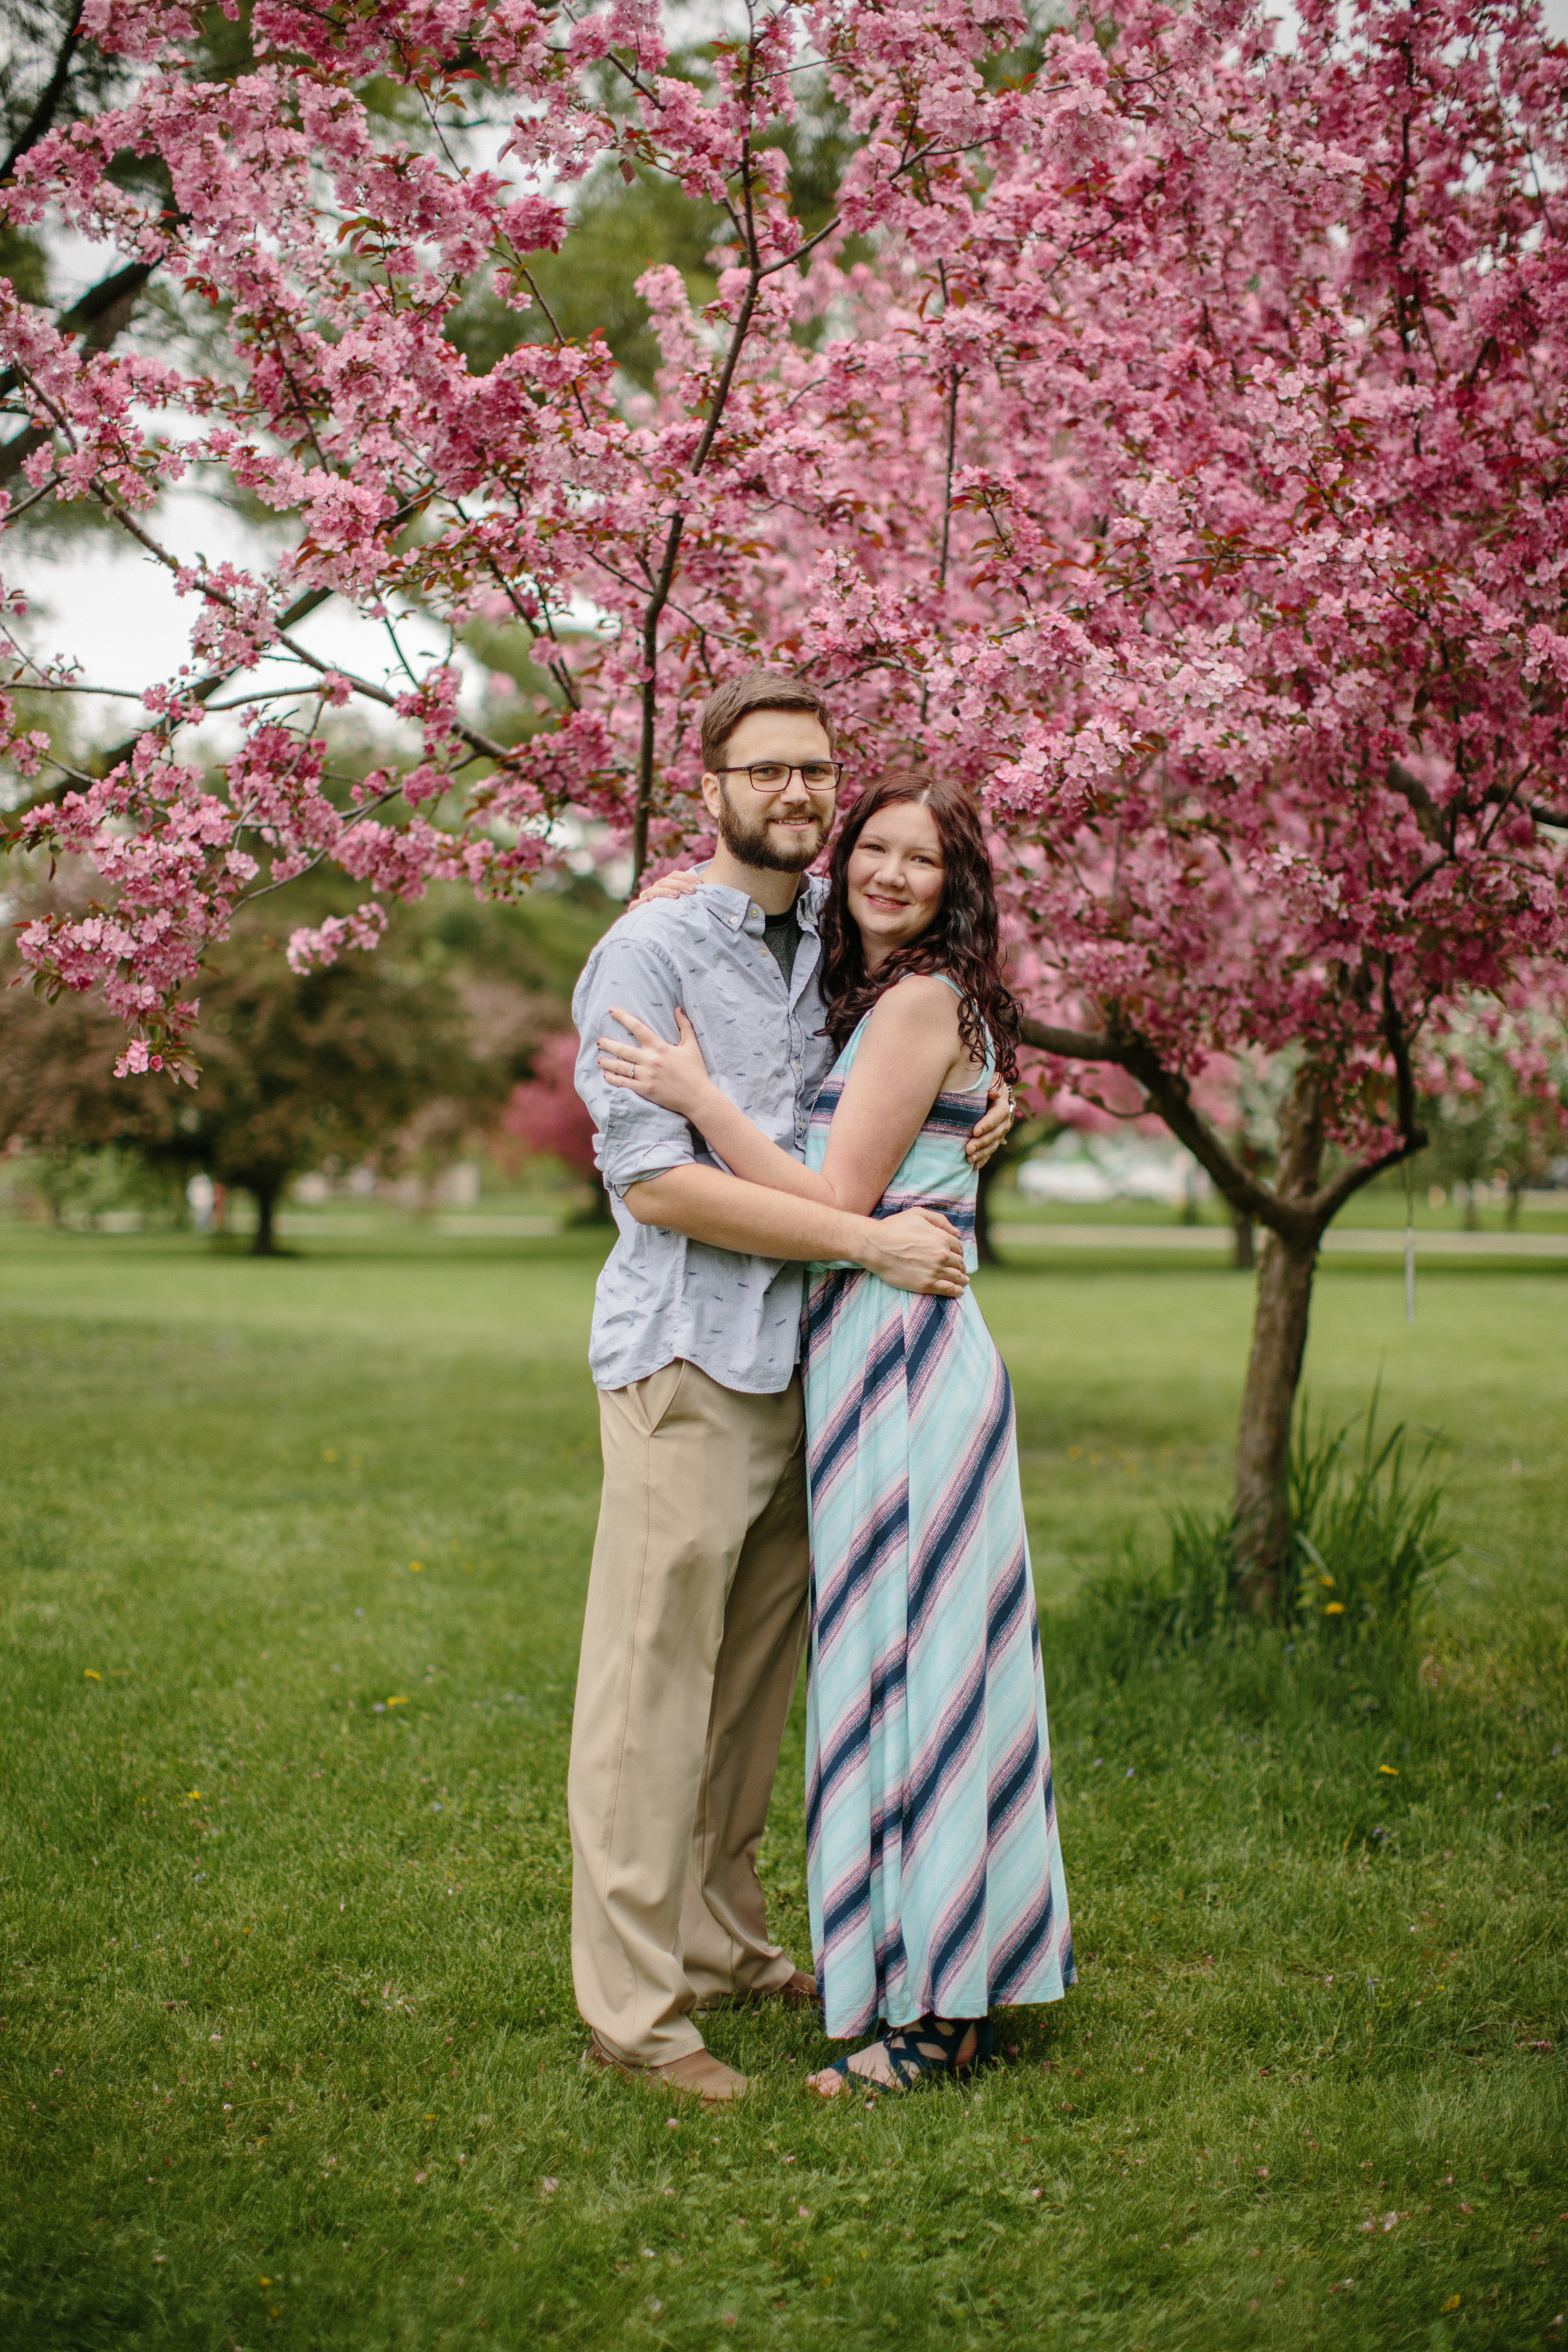 Ankeny Des Moines Grimes Johnston Urbandale wedding photographers